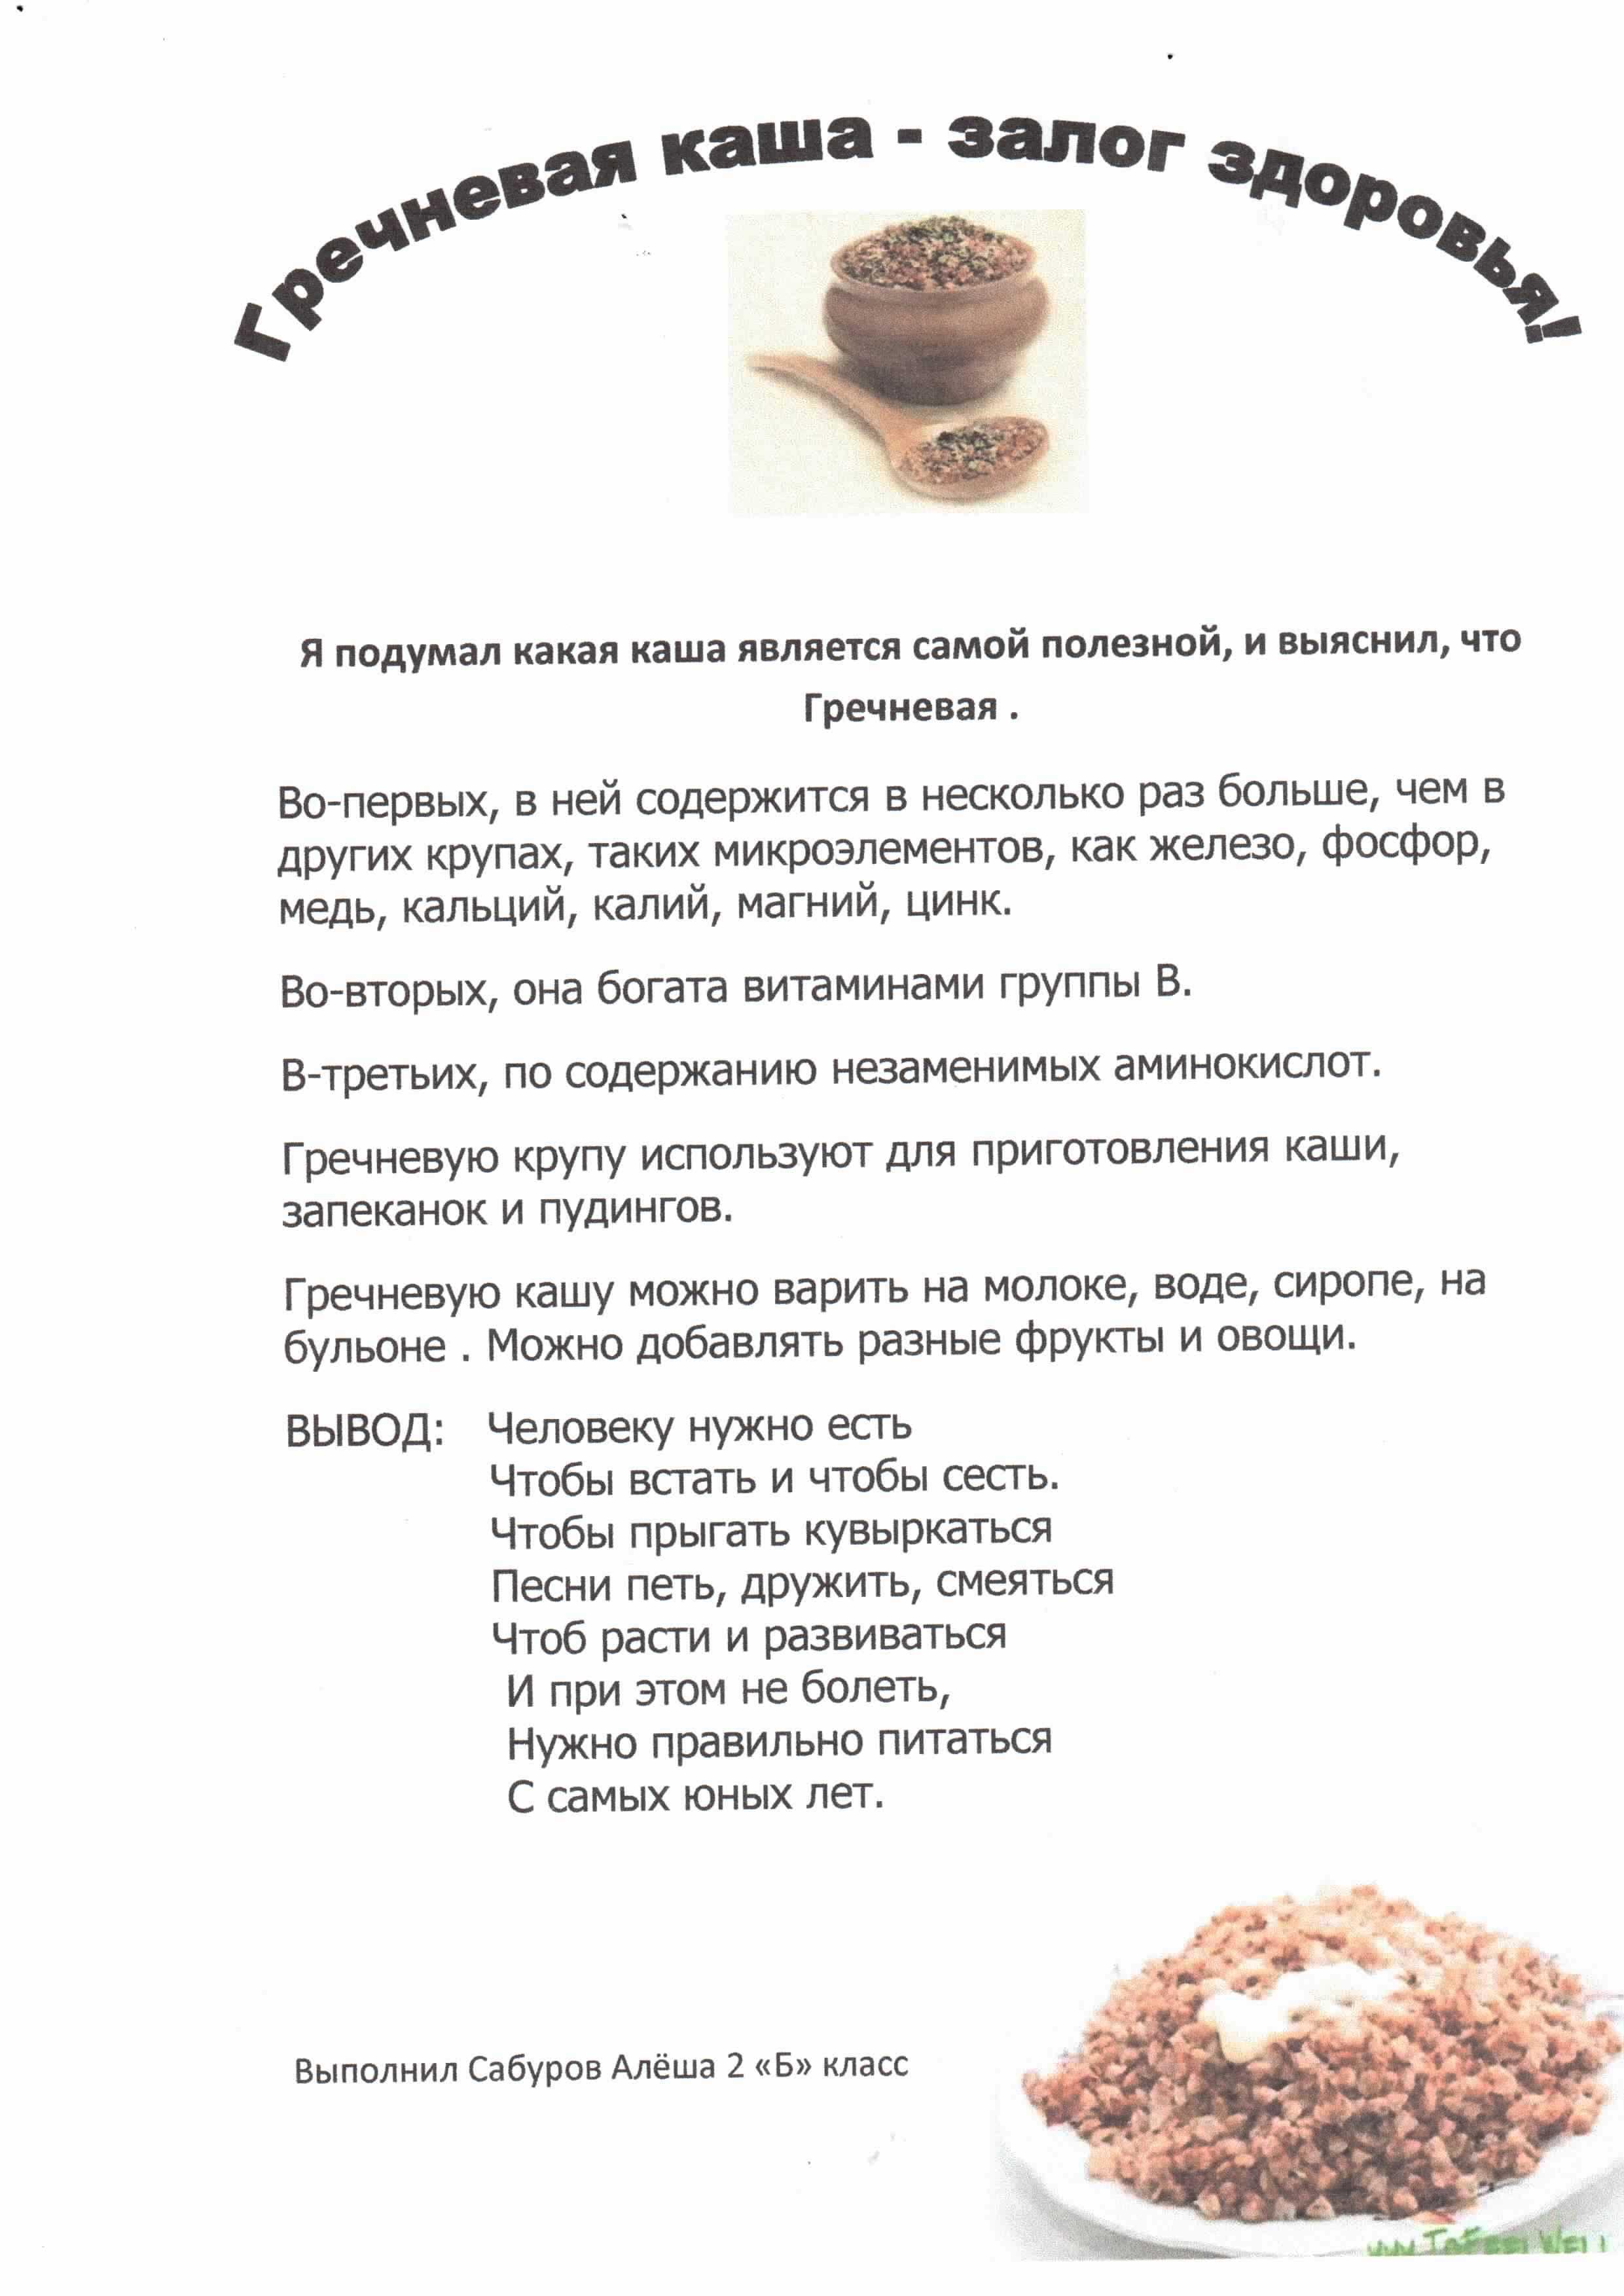 C:\Users\Татьяна\Desktop\питание\_20150118_21515008.jpg